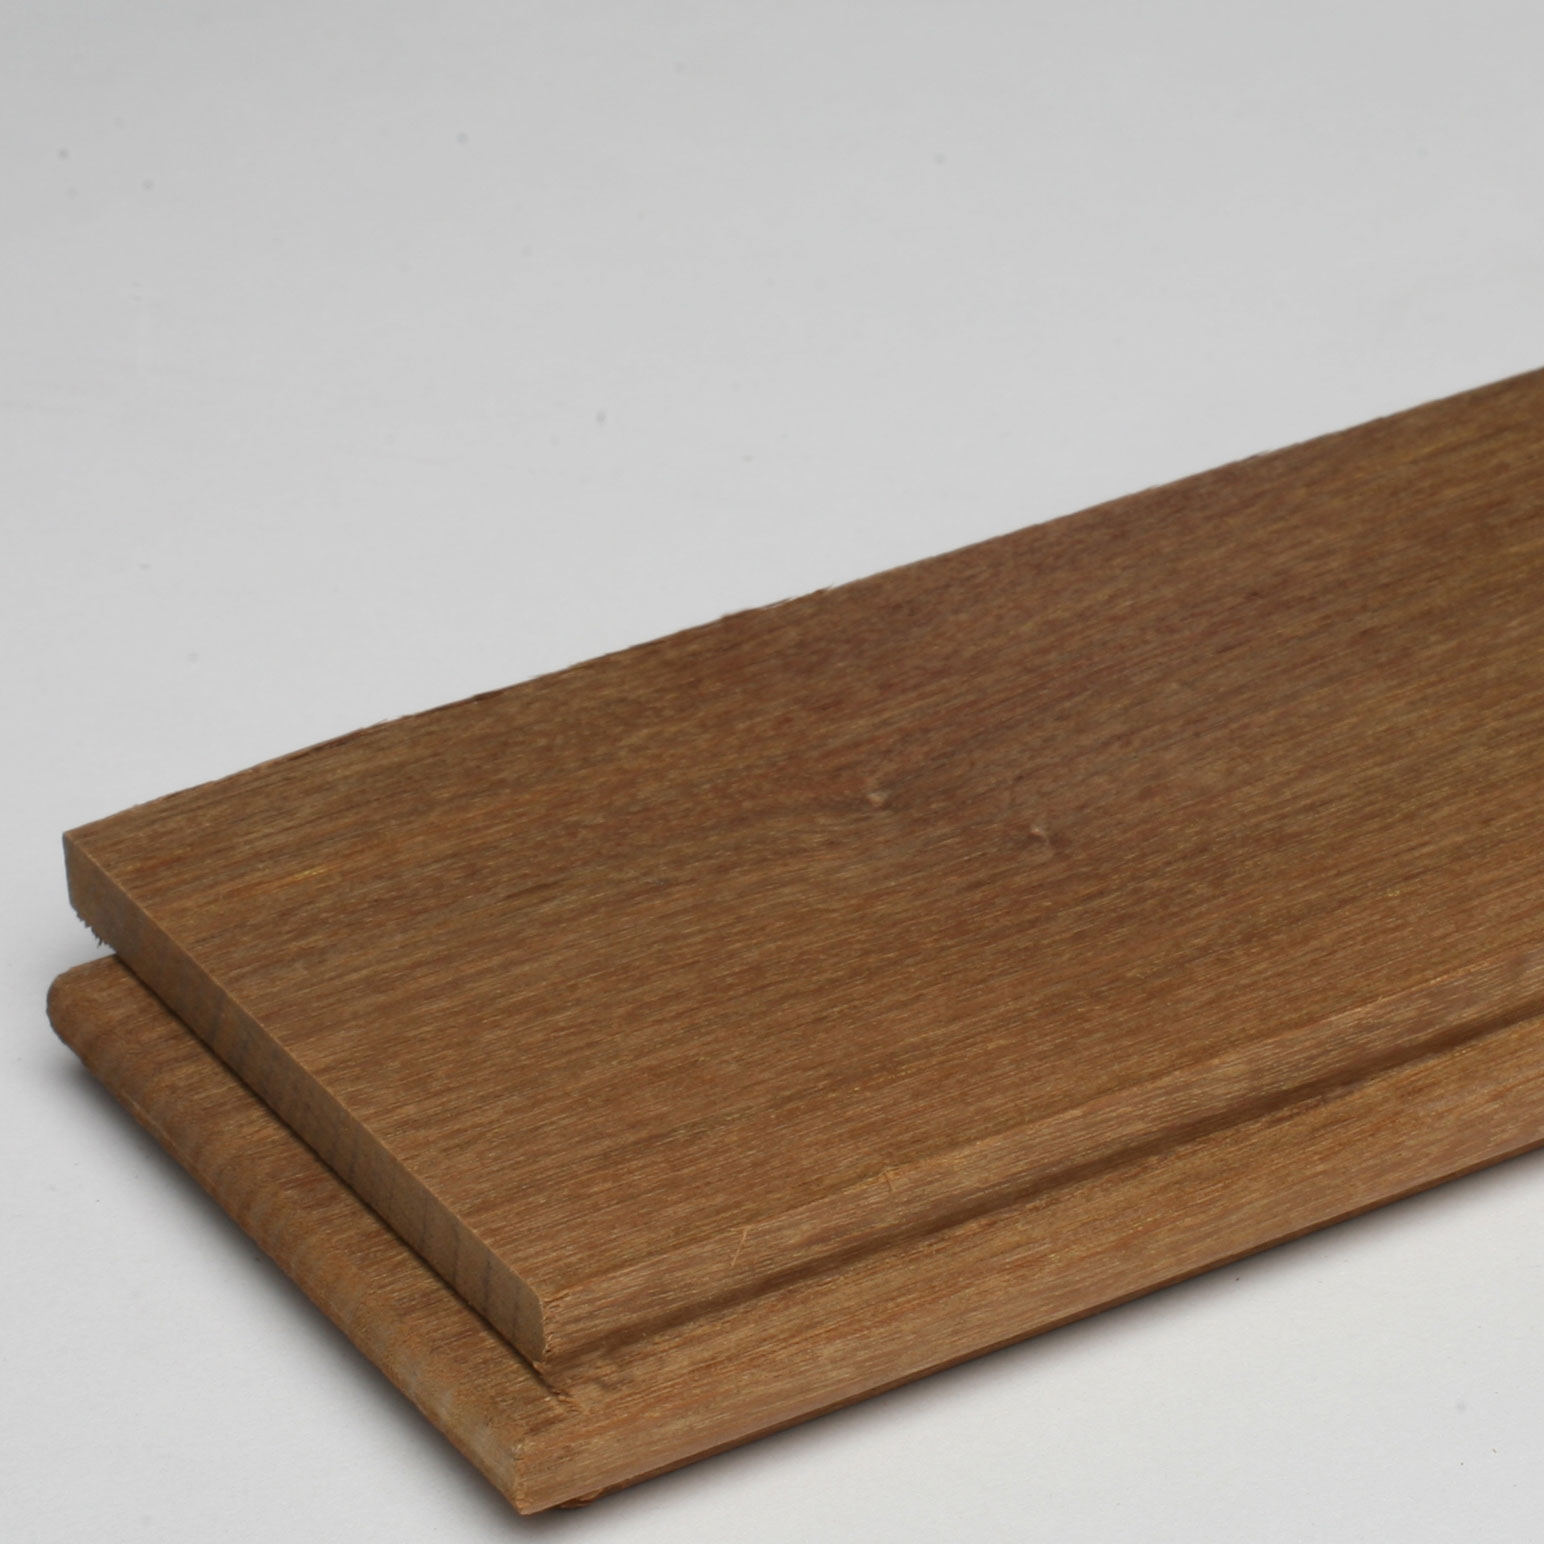 Ipe Hardwood Flooring Ipe 3 4 X 3 X 1 7 39 Select